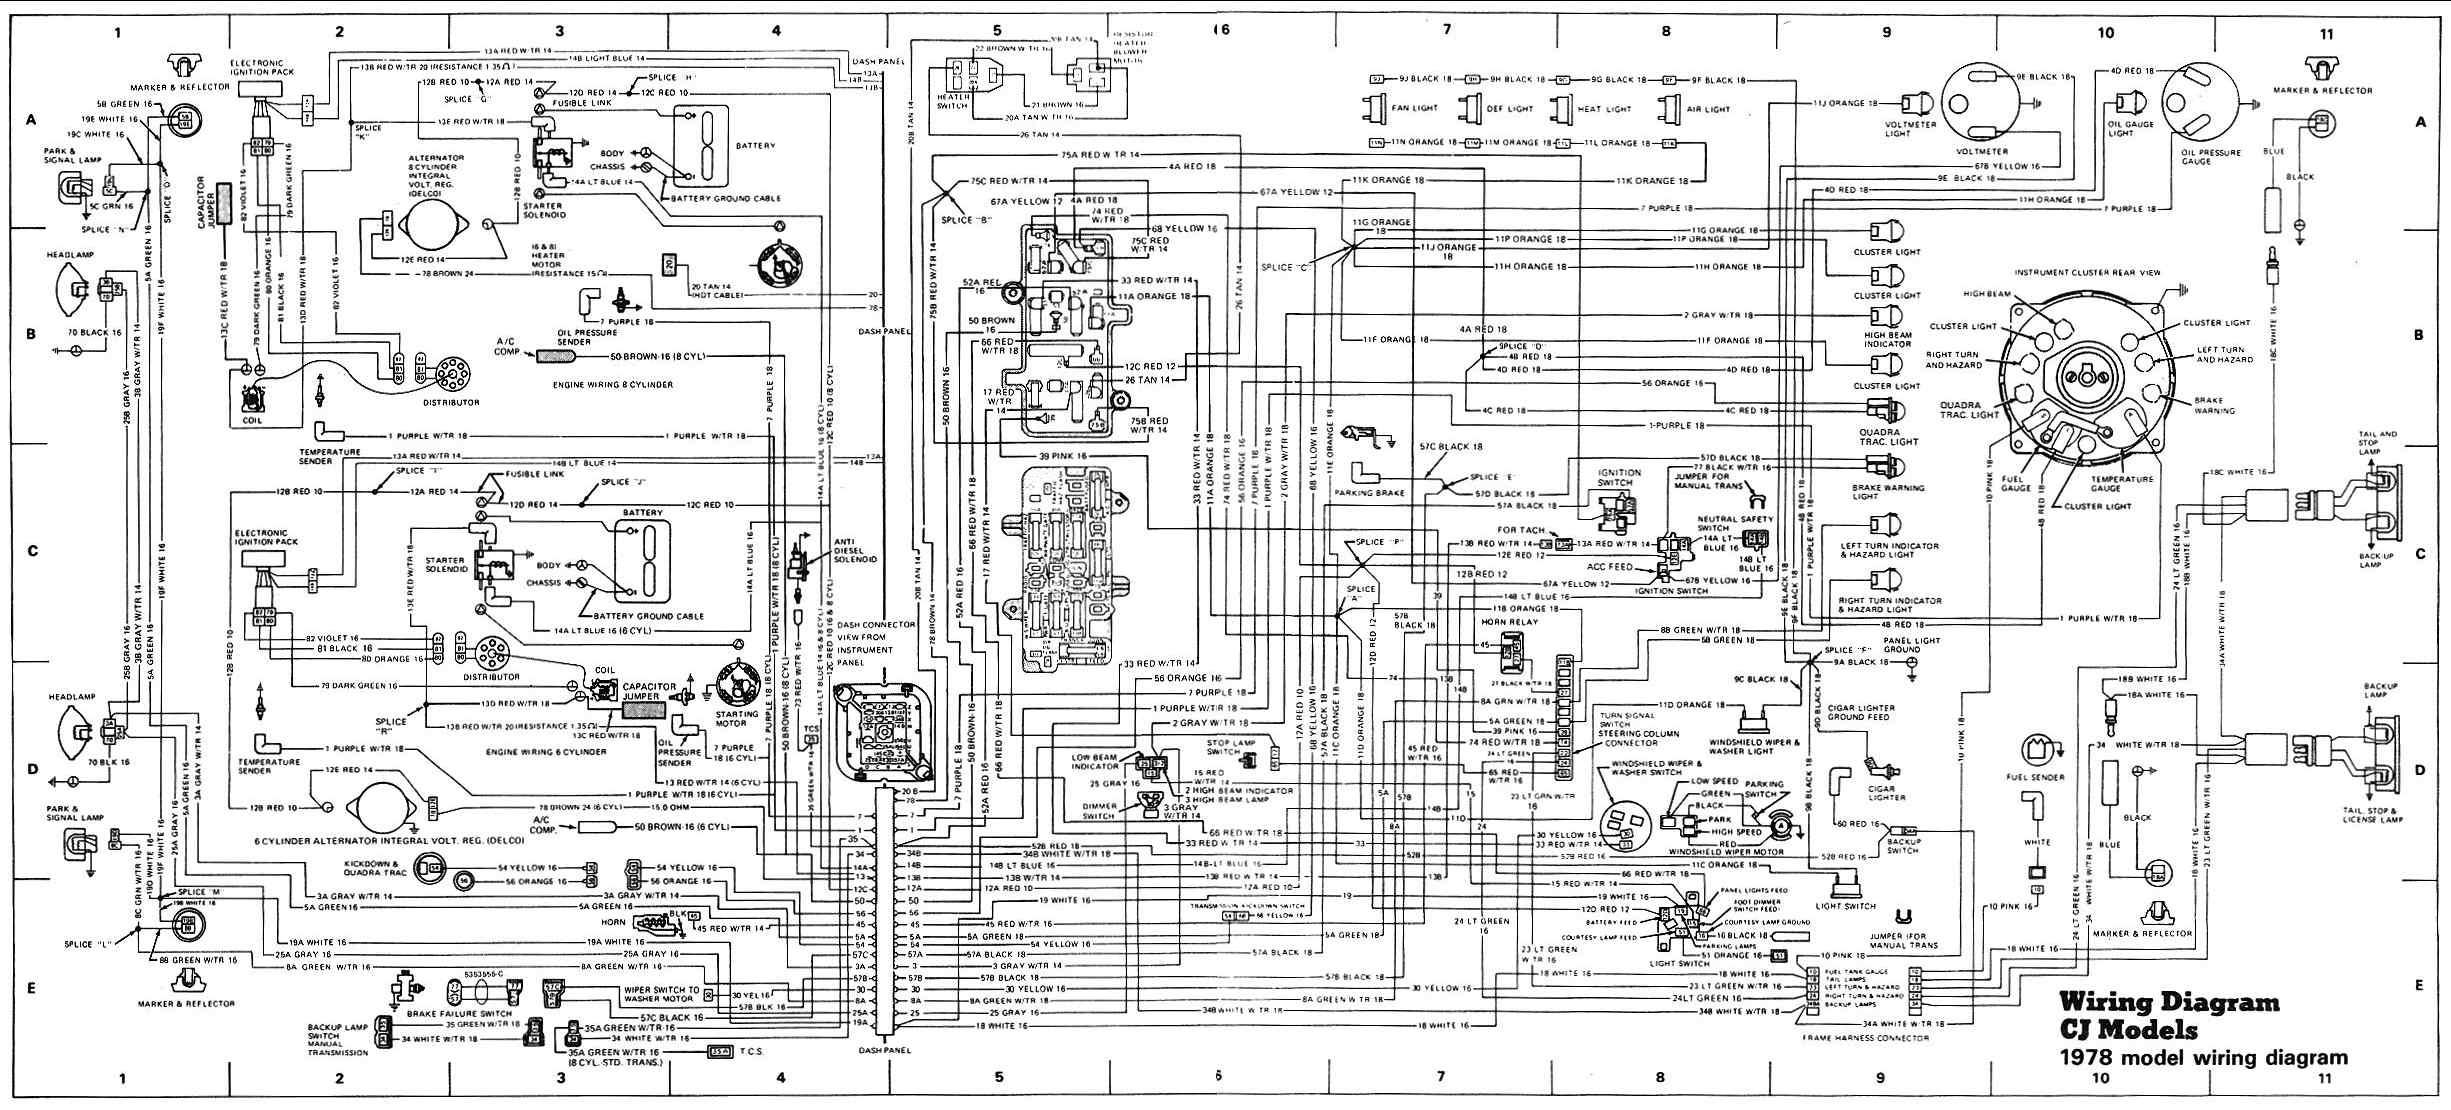 hight resolution of 1997 jeep tj fuel pump wiring diagram wiring library rh 33 bloxhuette de 1997 jeep wrangler wiring diagram pcm 1997 jeep wrangler fuse diagram